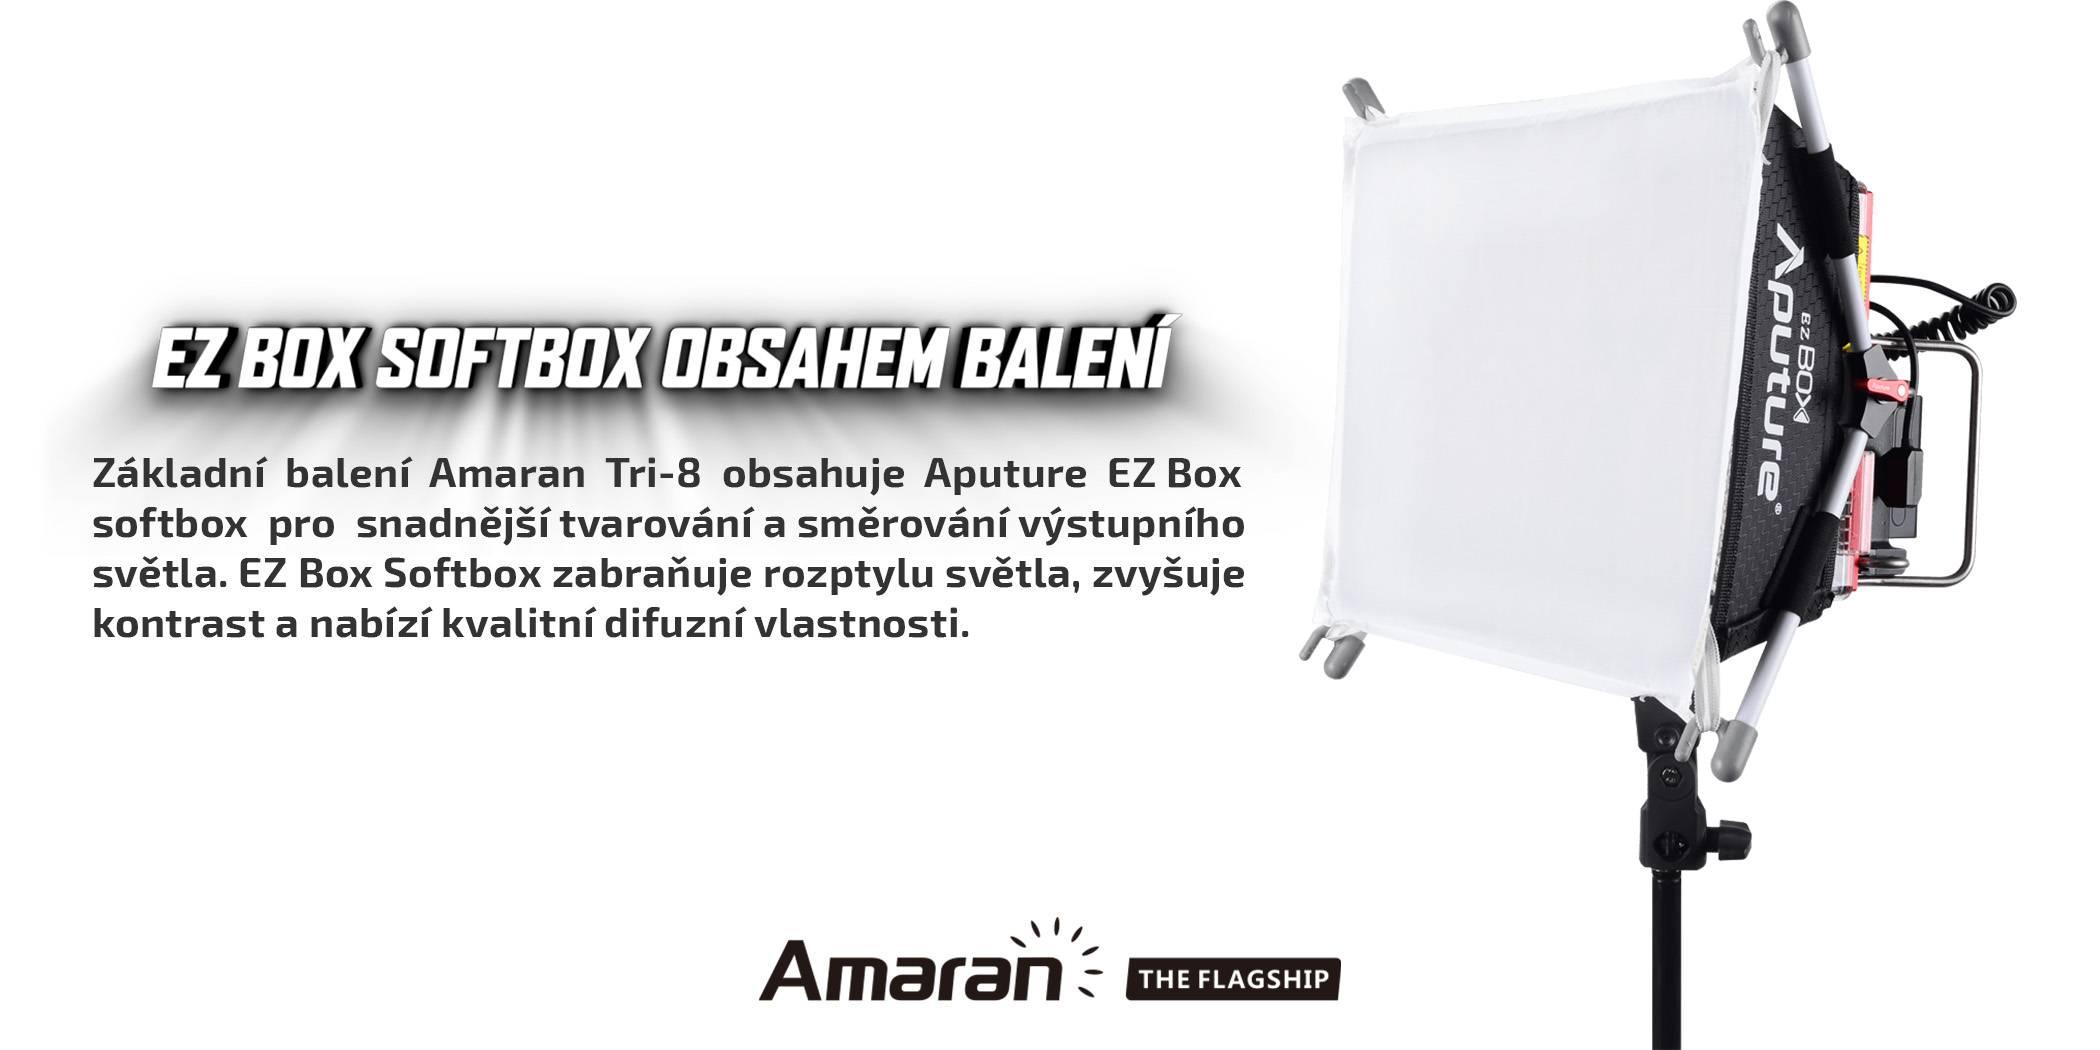 film-technika-aputure-tri-8-ez-box-softbox-obsahem-balení